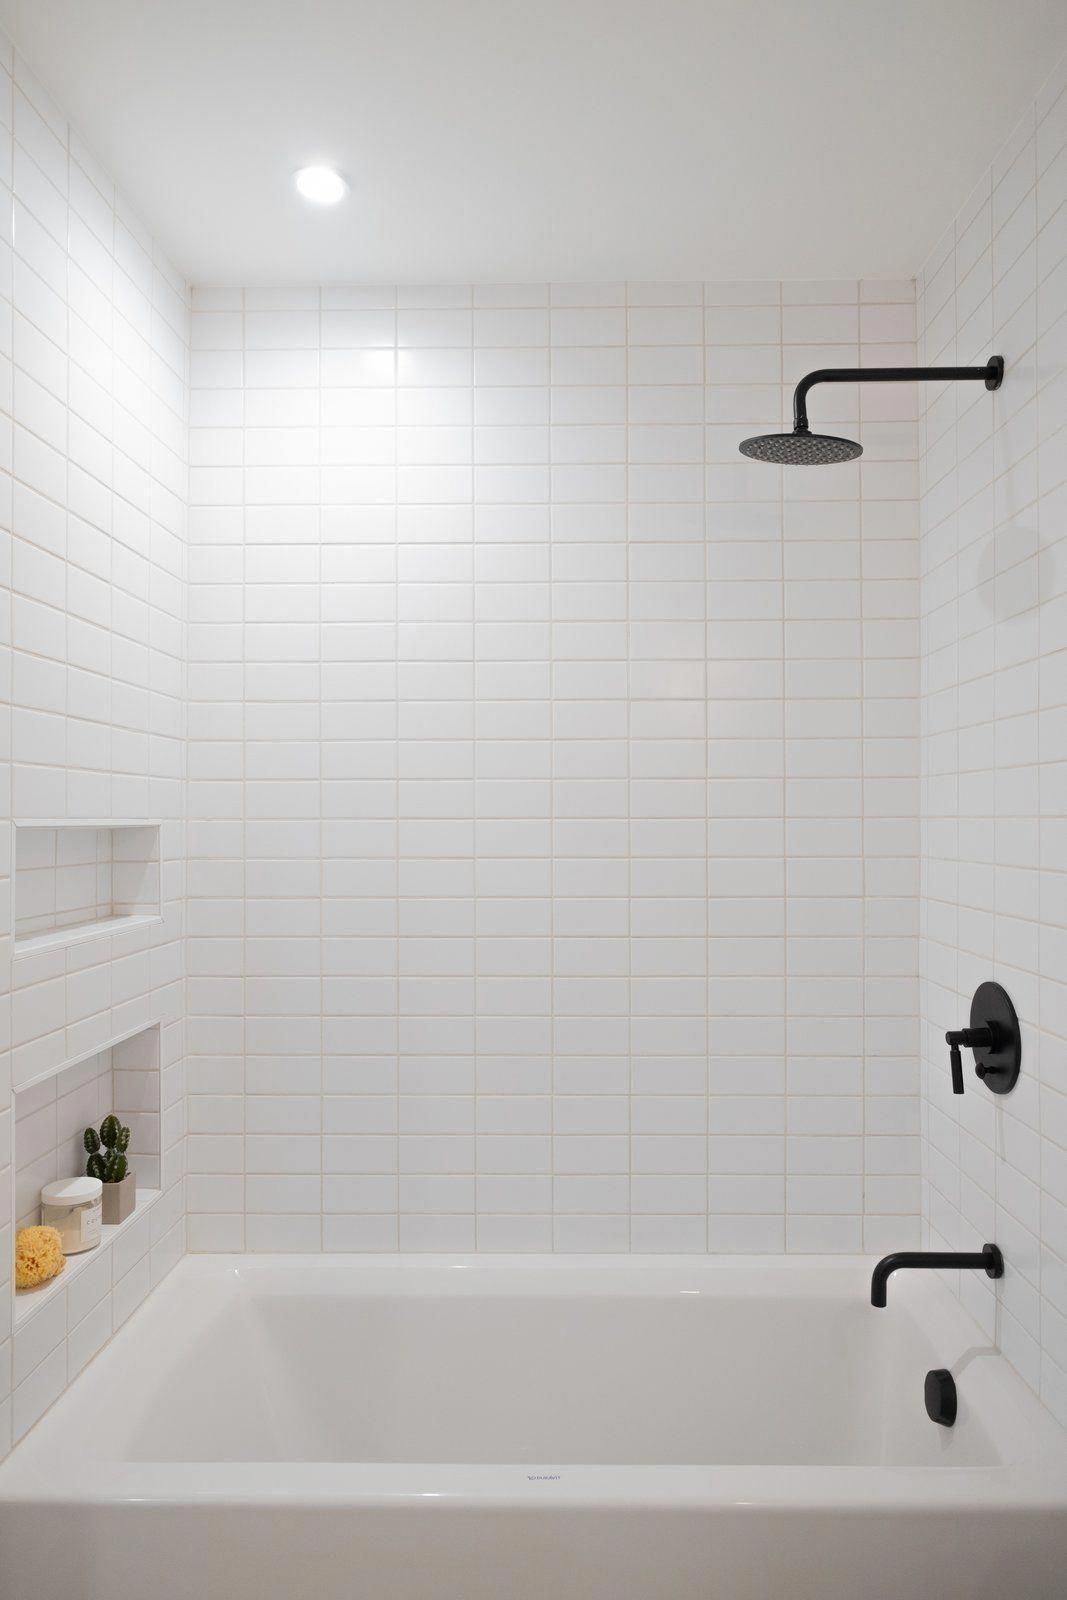 Bath Room Recessed Lighting Soaking Tub Full Shower Subway Tile Wall And Ceiling Lighting Each Bathr In 2020 Shower Remodel White Subway Tile Bathroom Shower Tile